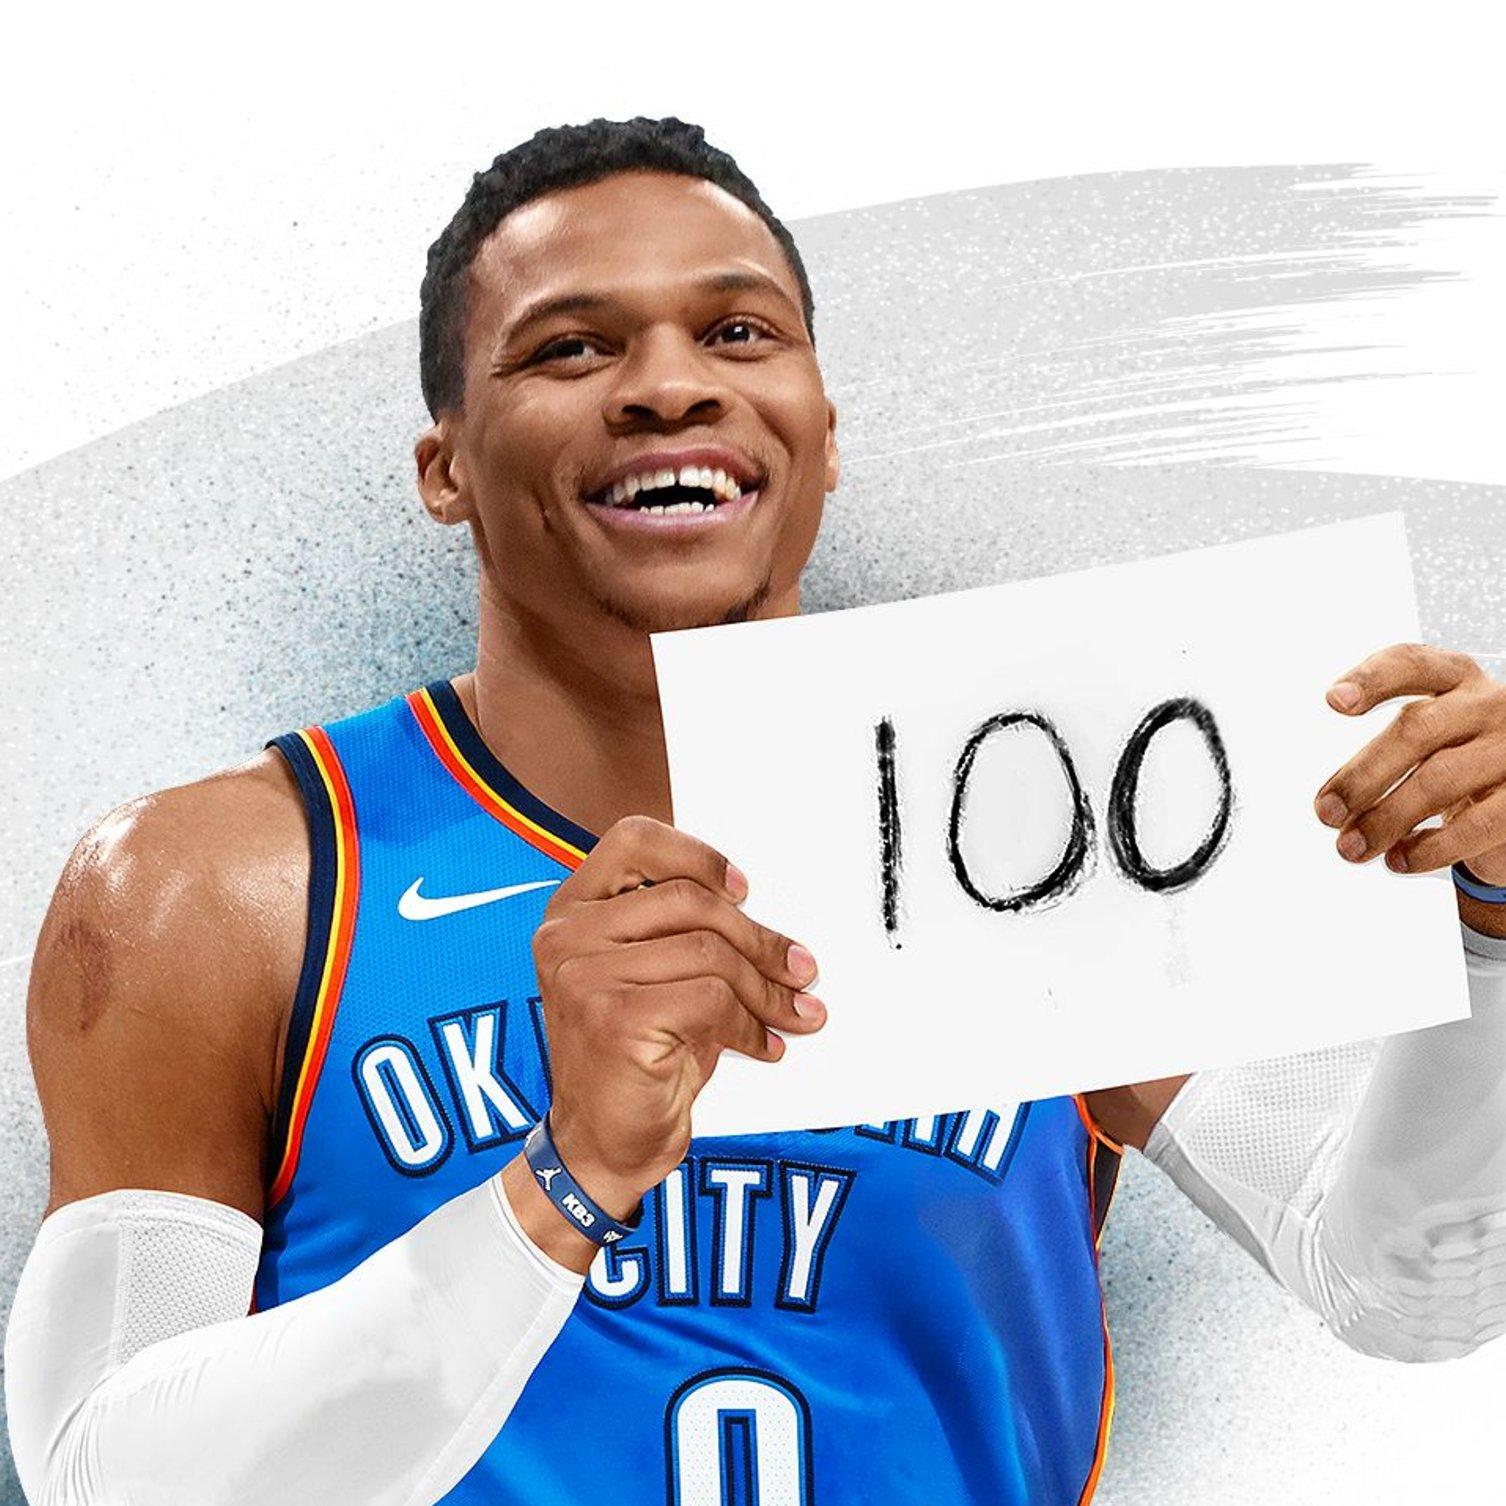 ICYMI: Russ joined the 100 (triple-doubles) club last night. https://t.co/JRfEbMq8fc